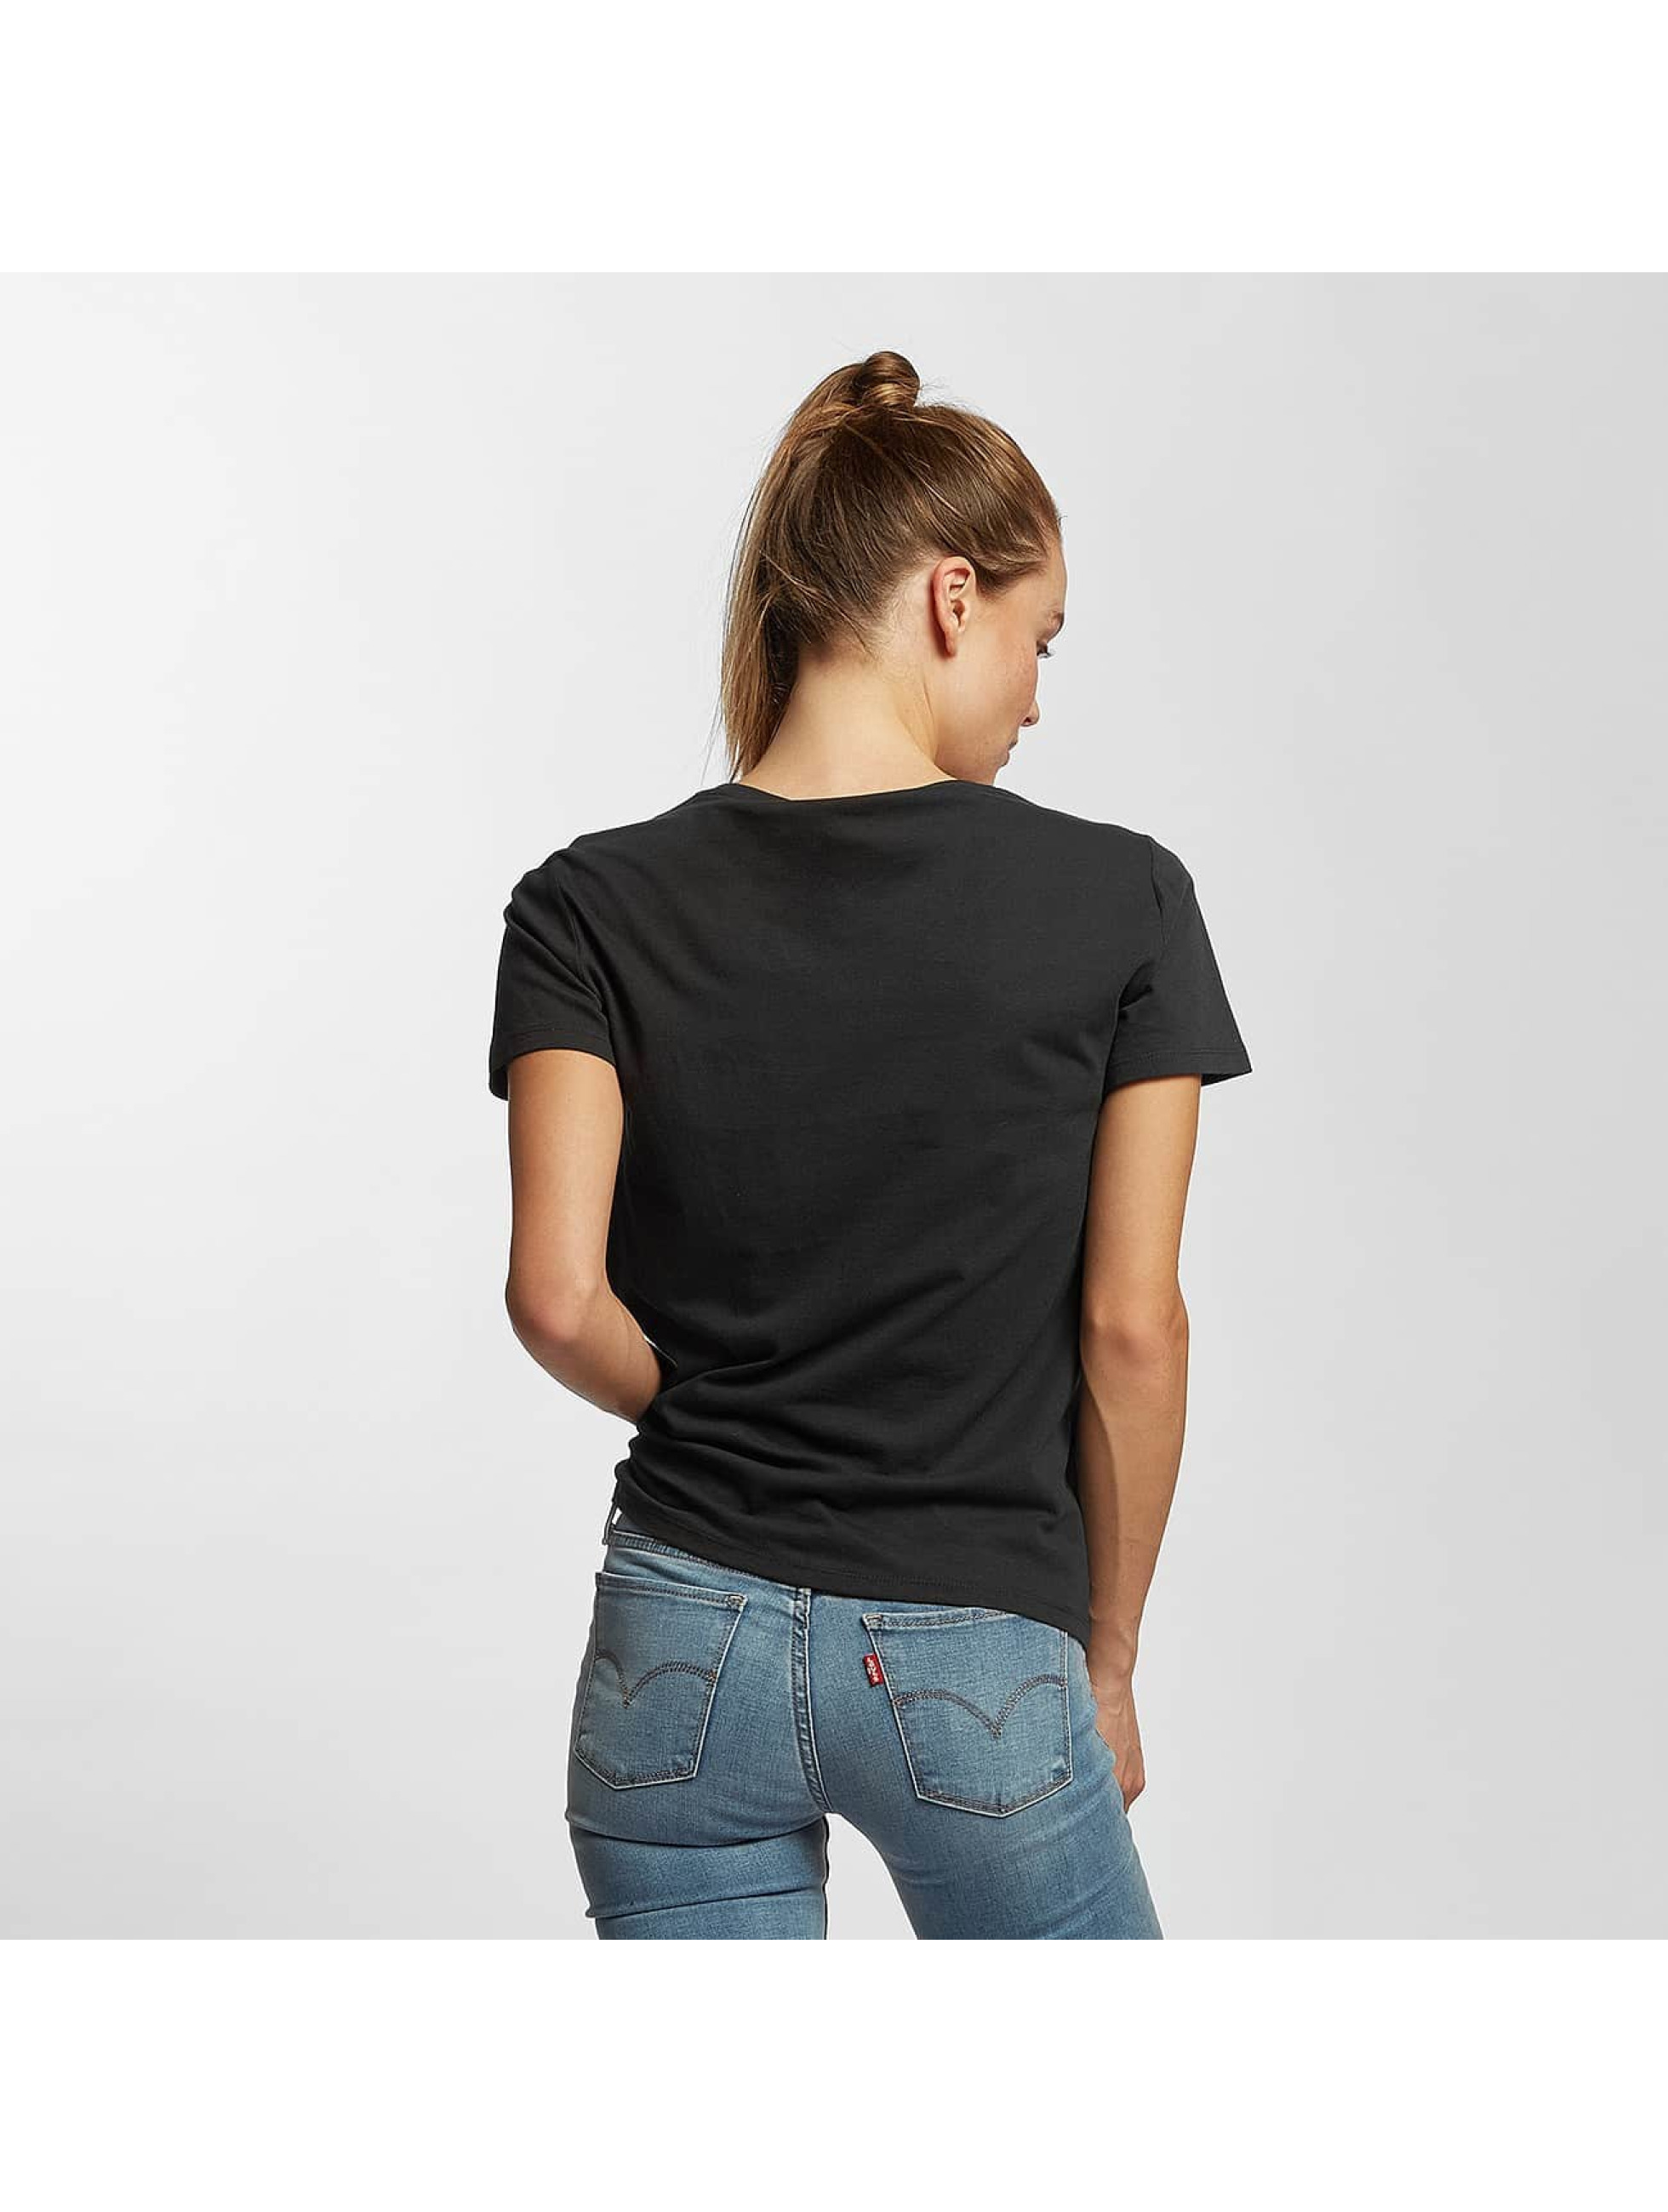 Levi's® T-Shirt Perfect Graphic Levi Strauss schwarz